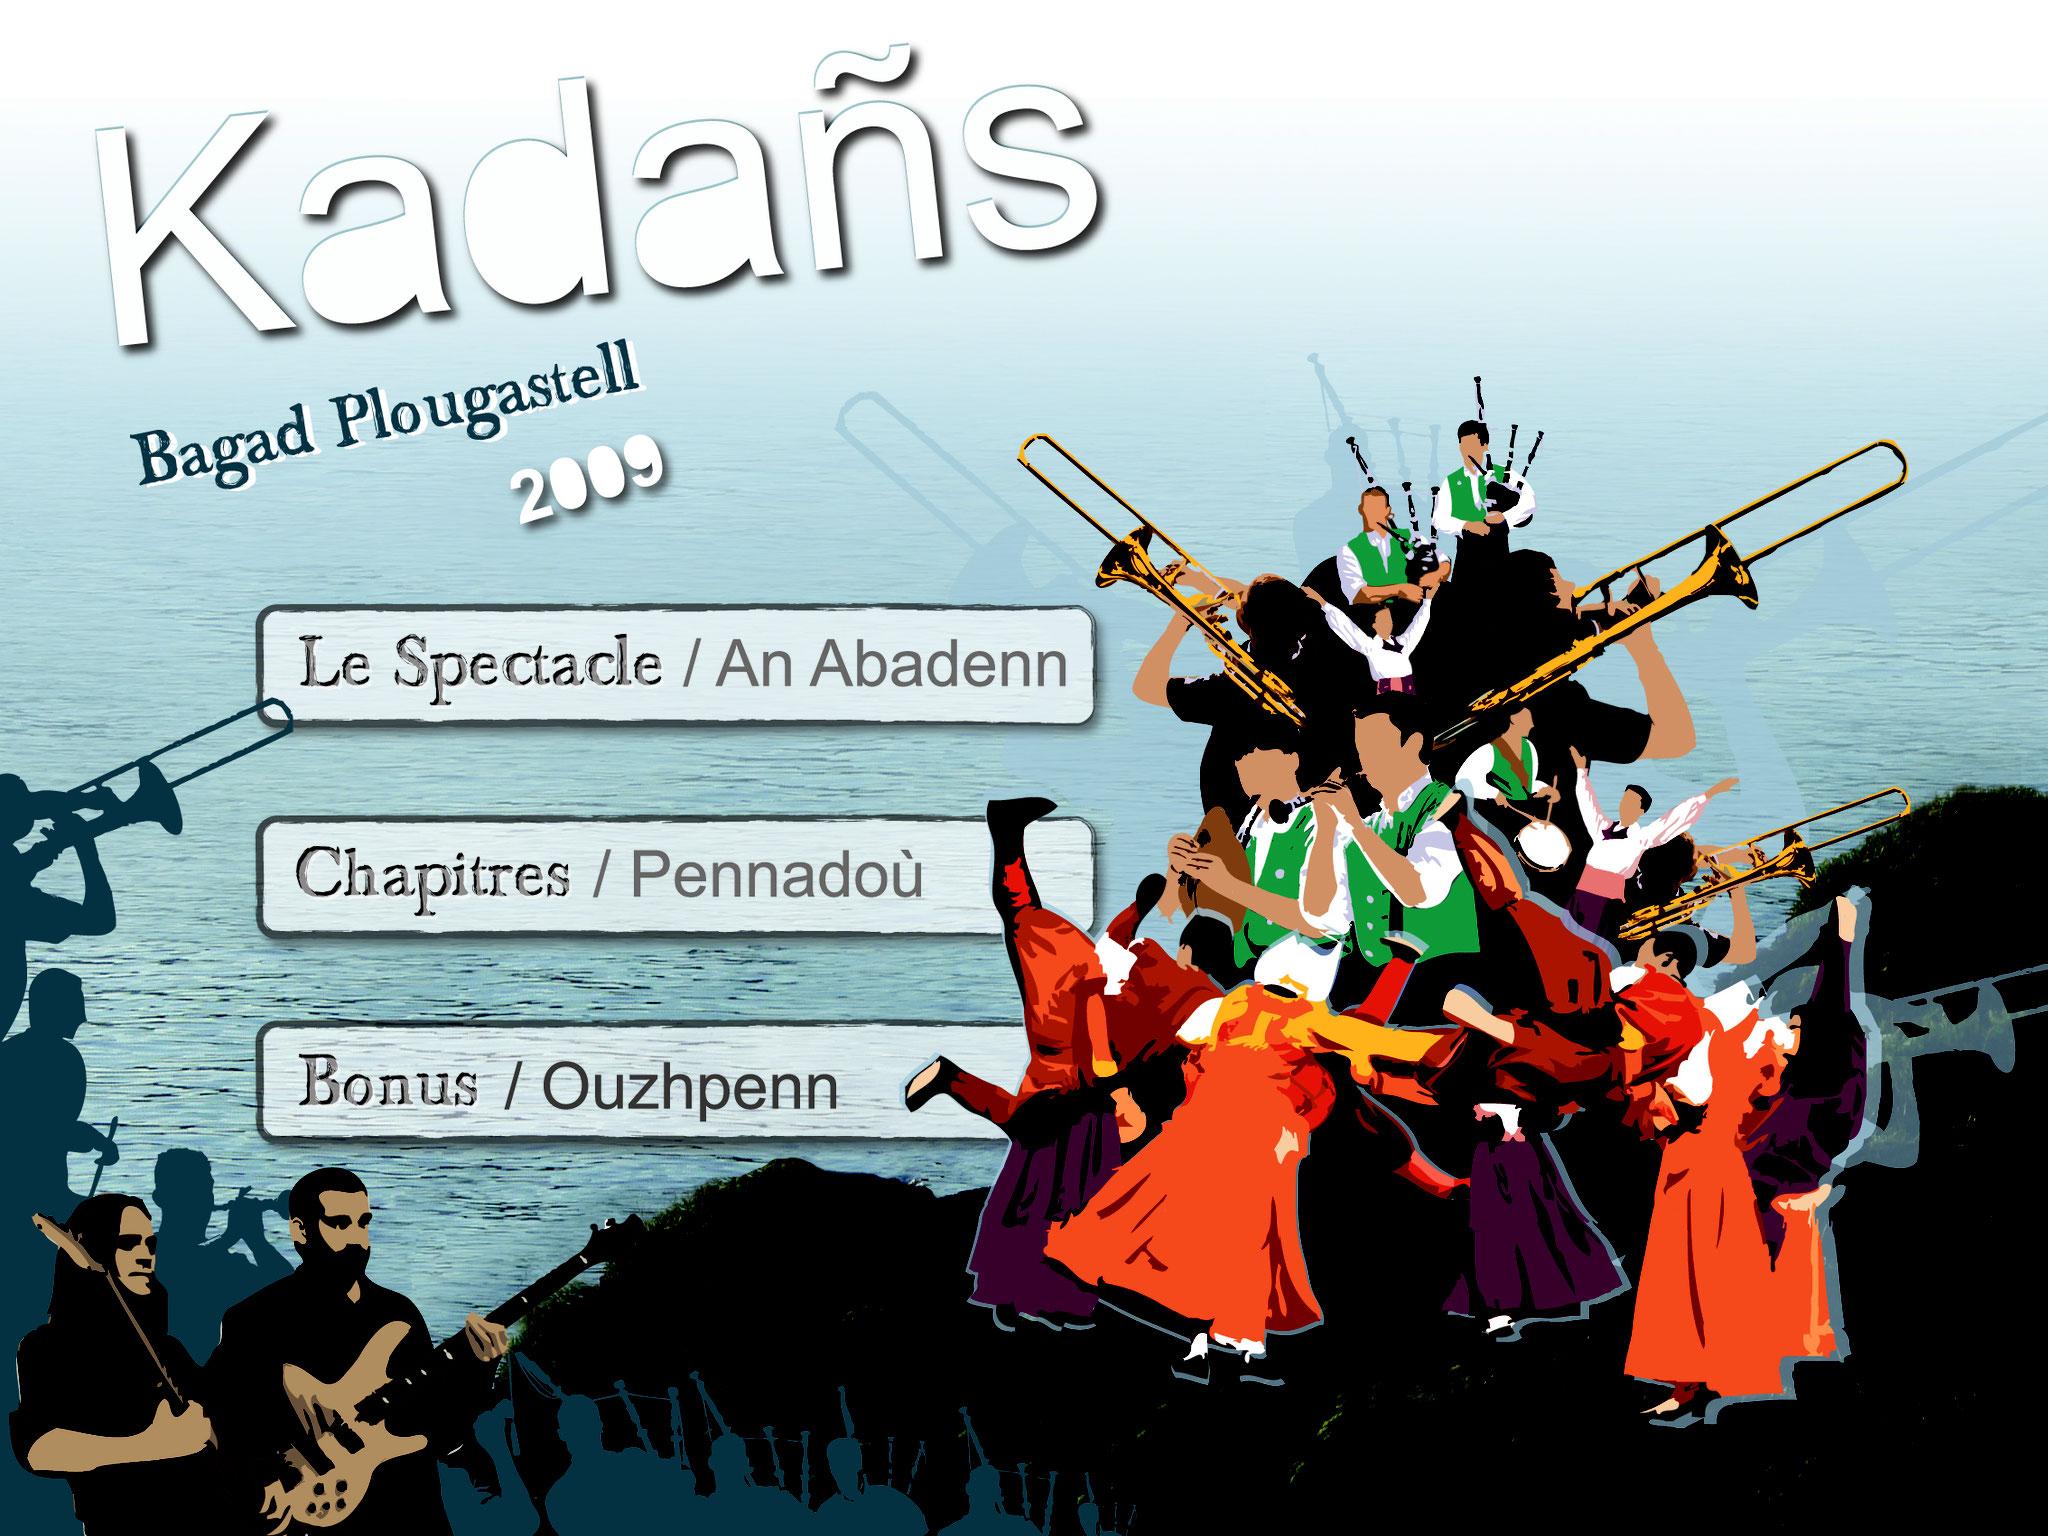 Menu du DVD du Spectacle KADAÑS du Bagad Plougastell